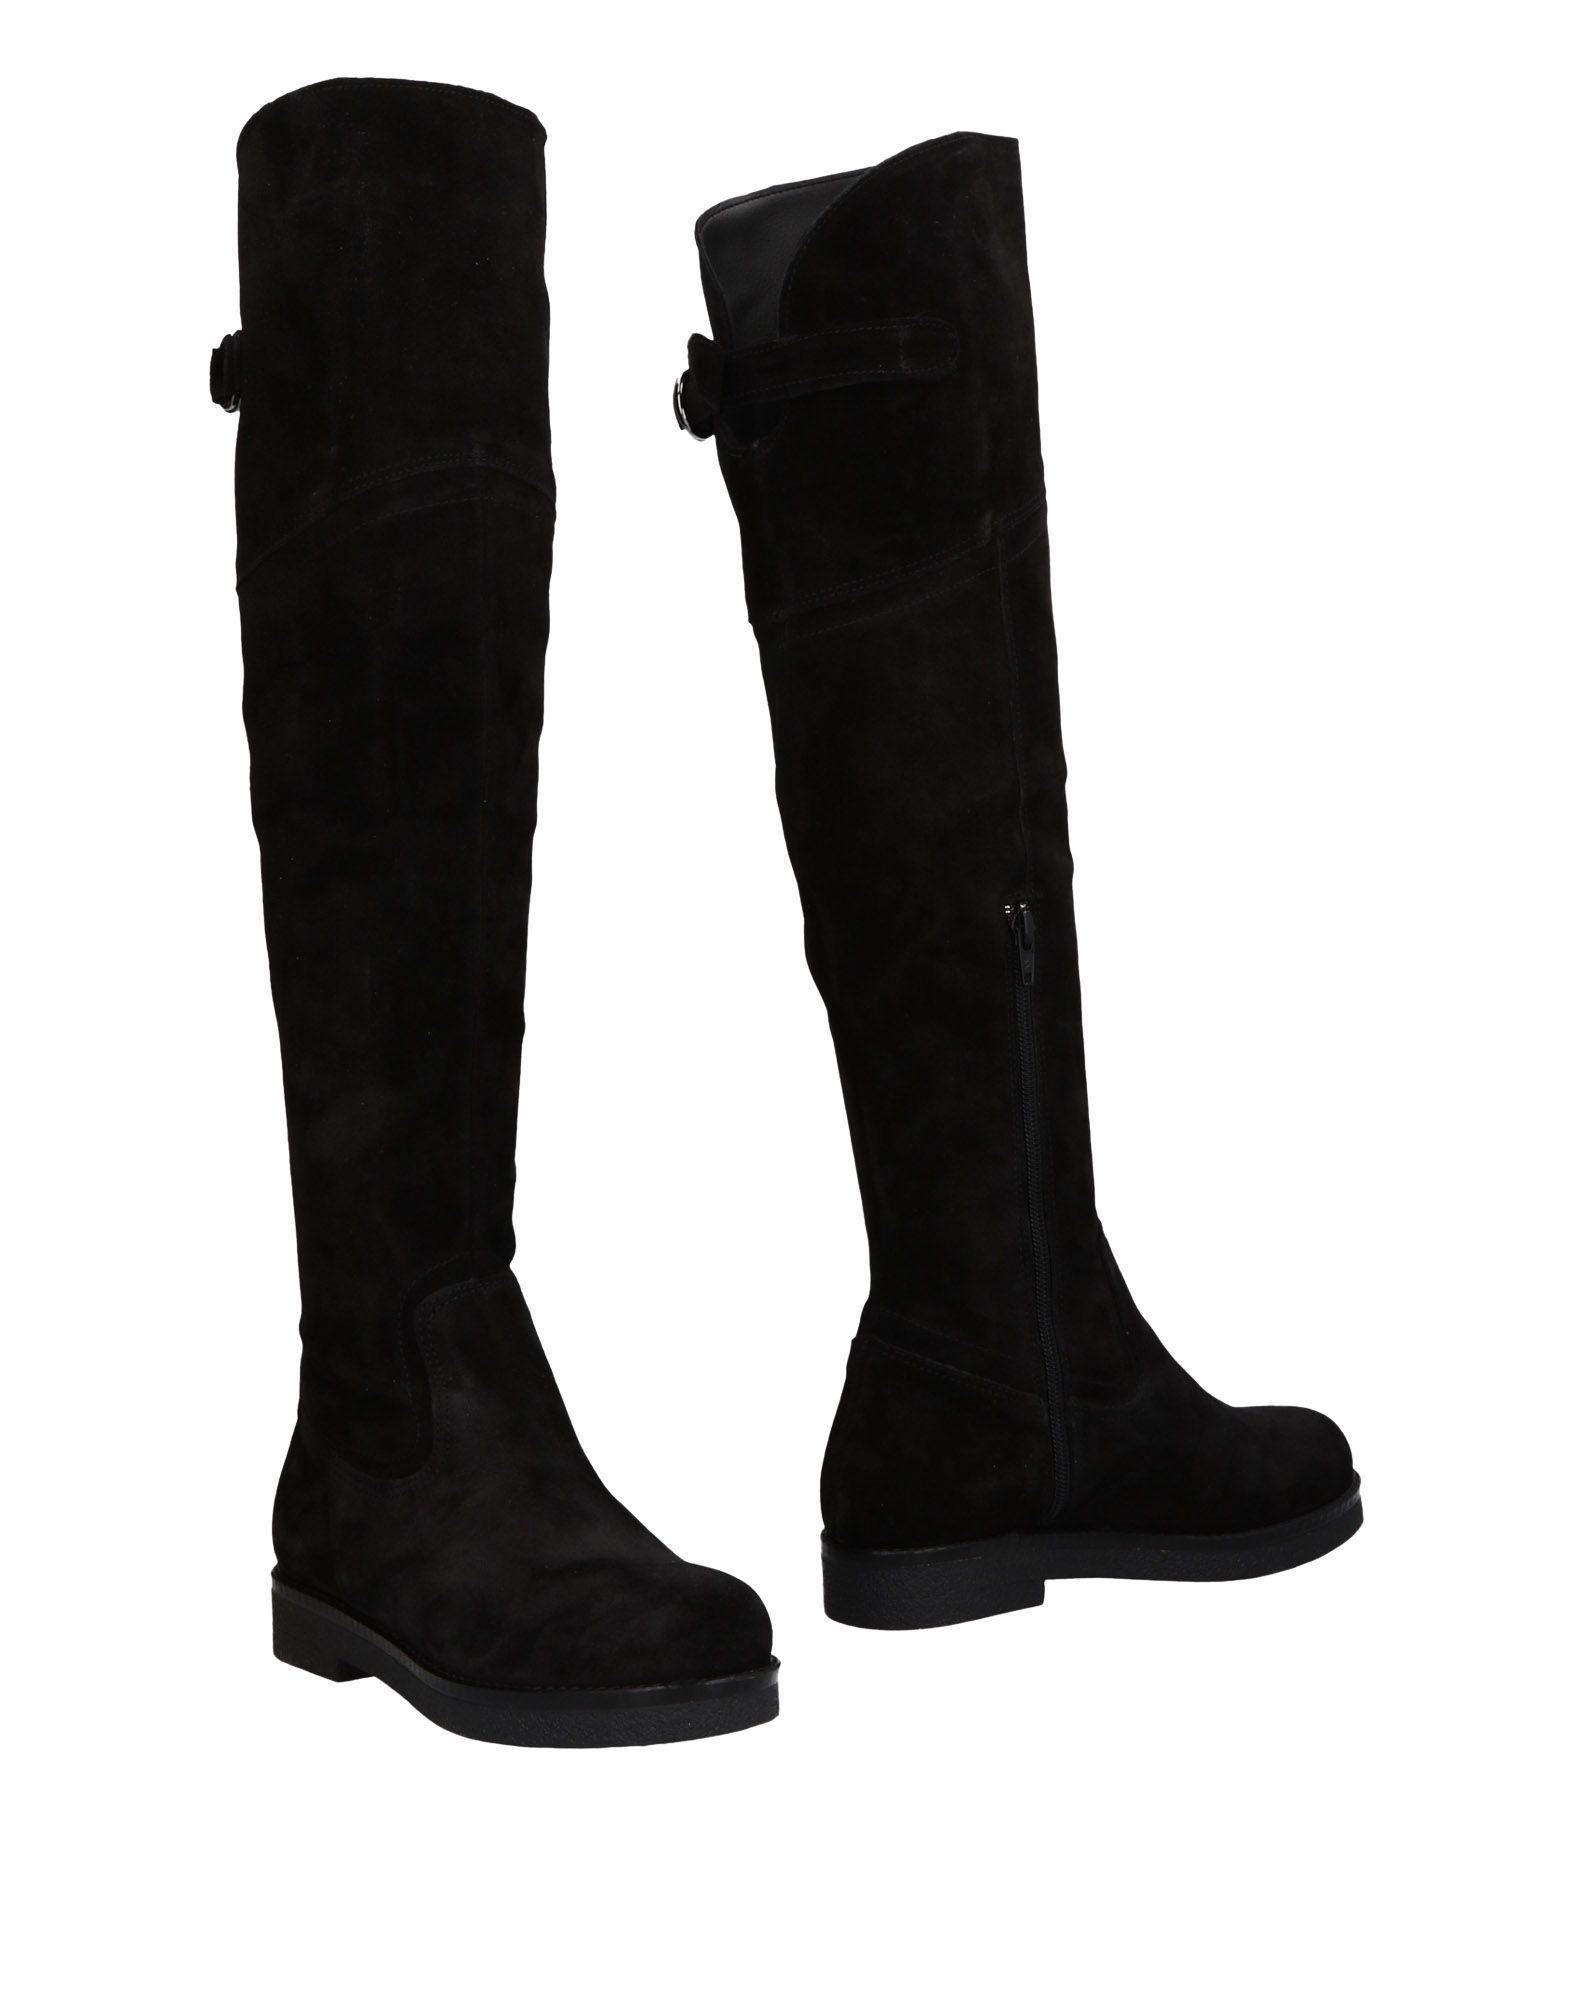 FOOTWEAR Nila & Nila Black Woman Leather